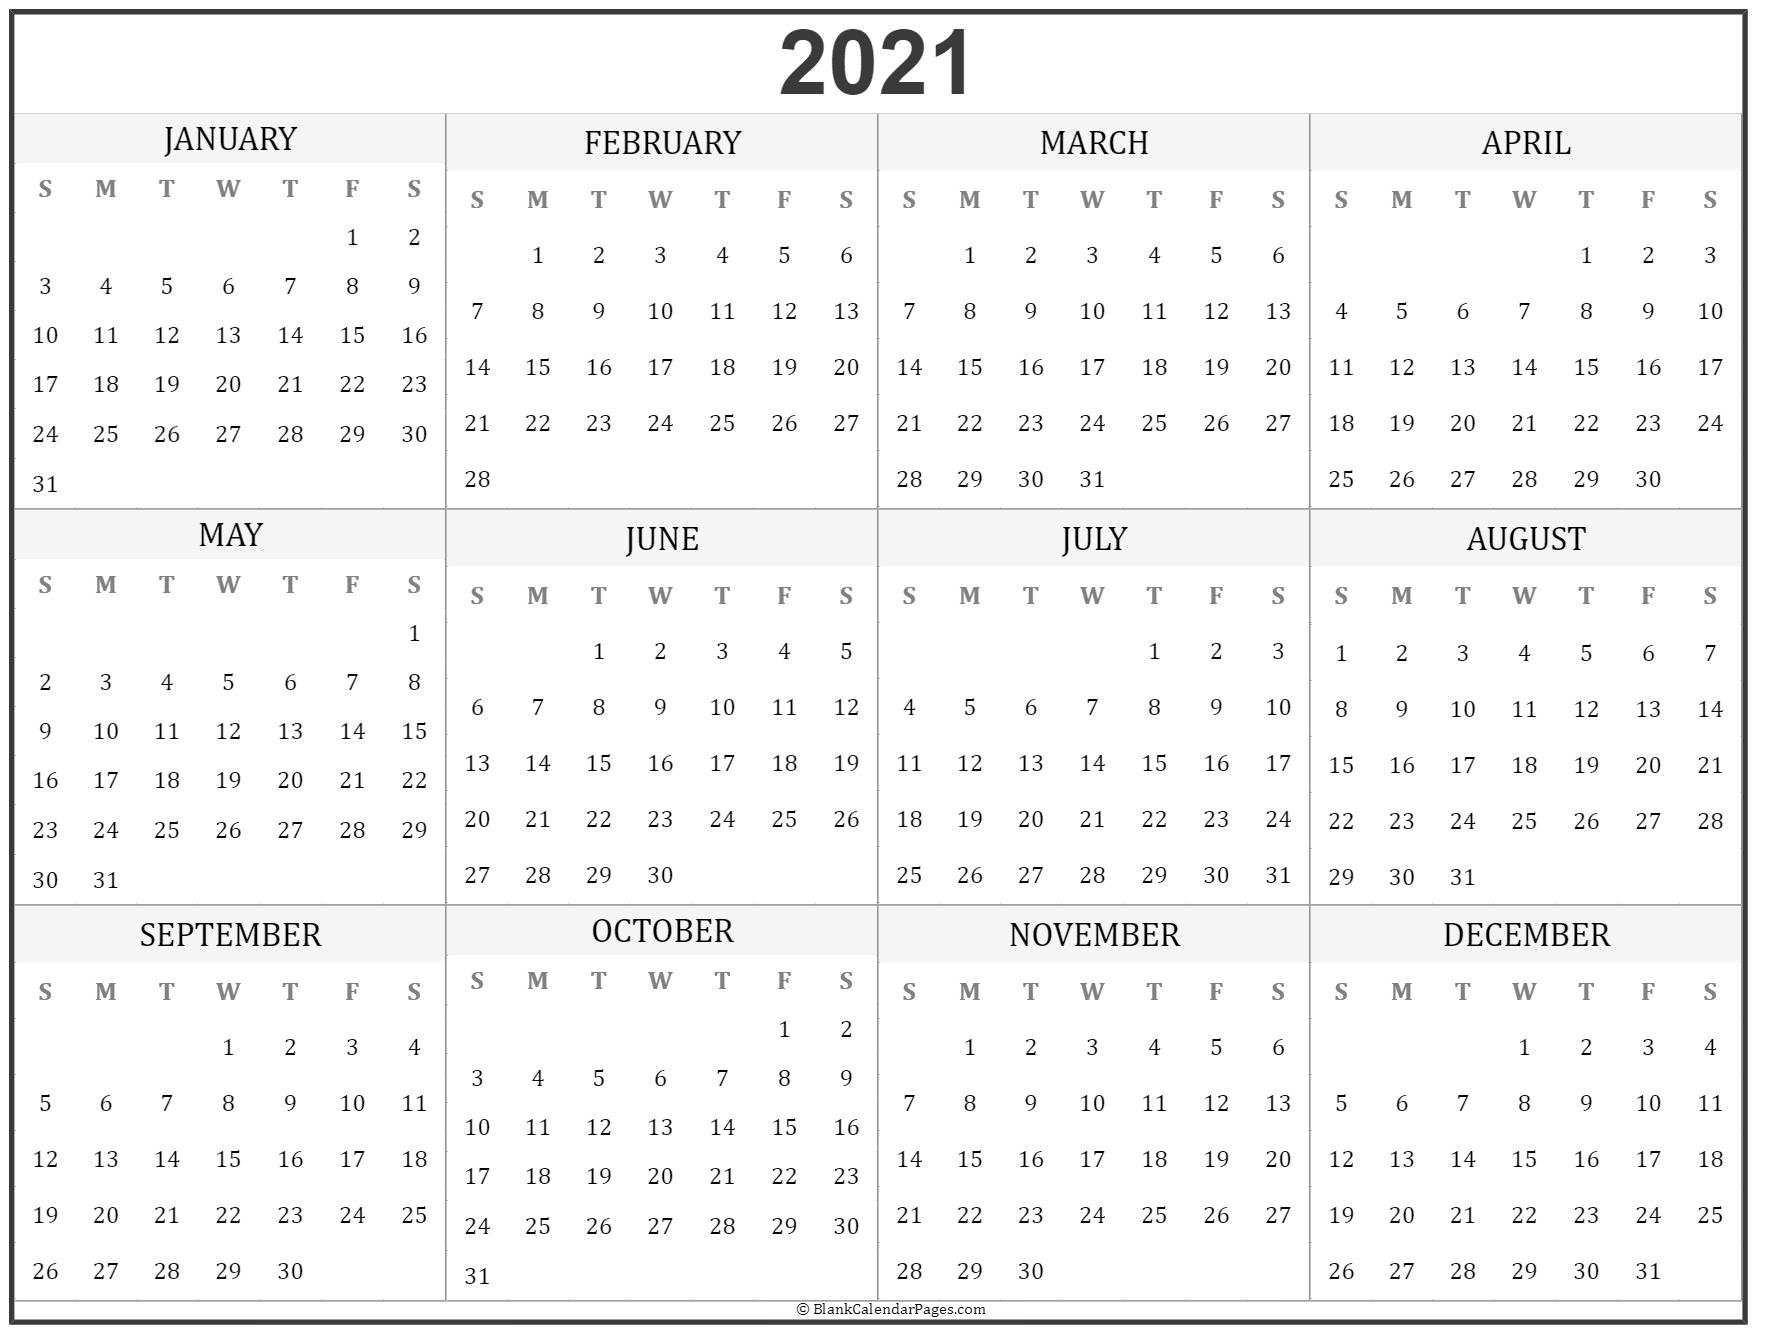 Holy Week 2021 Calendar Philippines | Printablecalendarsfor2021 for 2021 Calendar Hong Kong Template Image